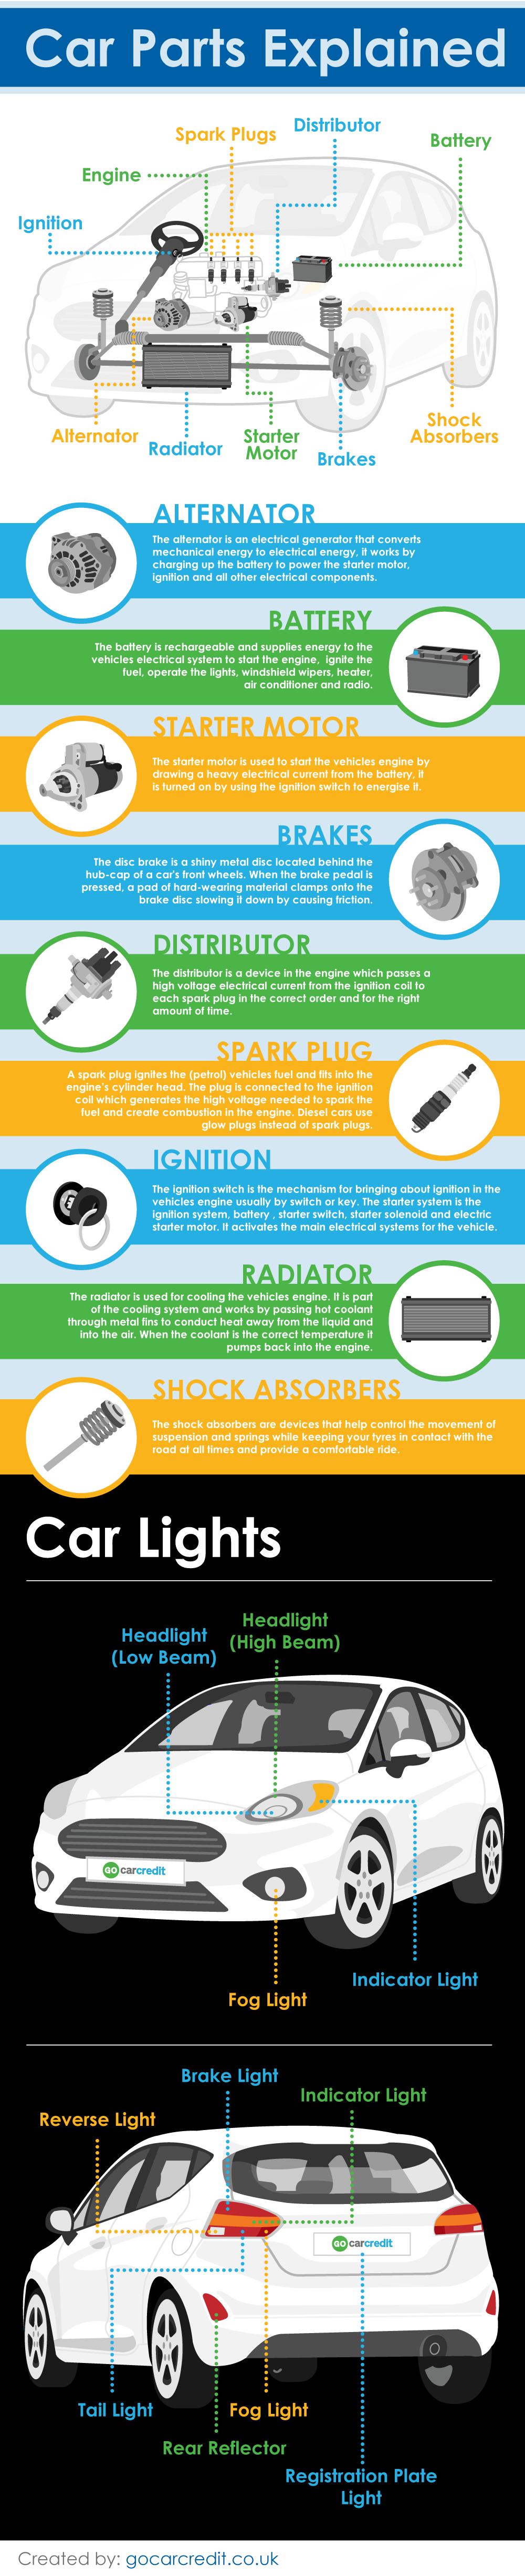 Car parts infographic